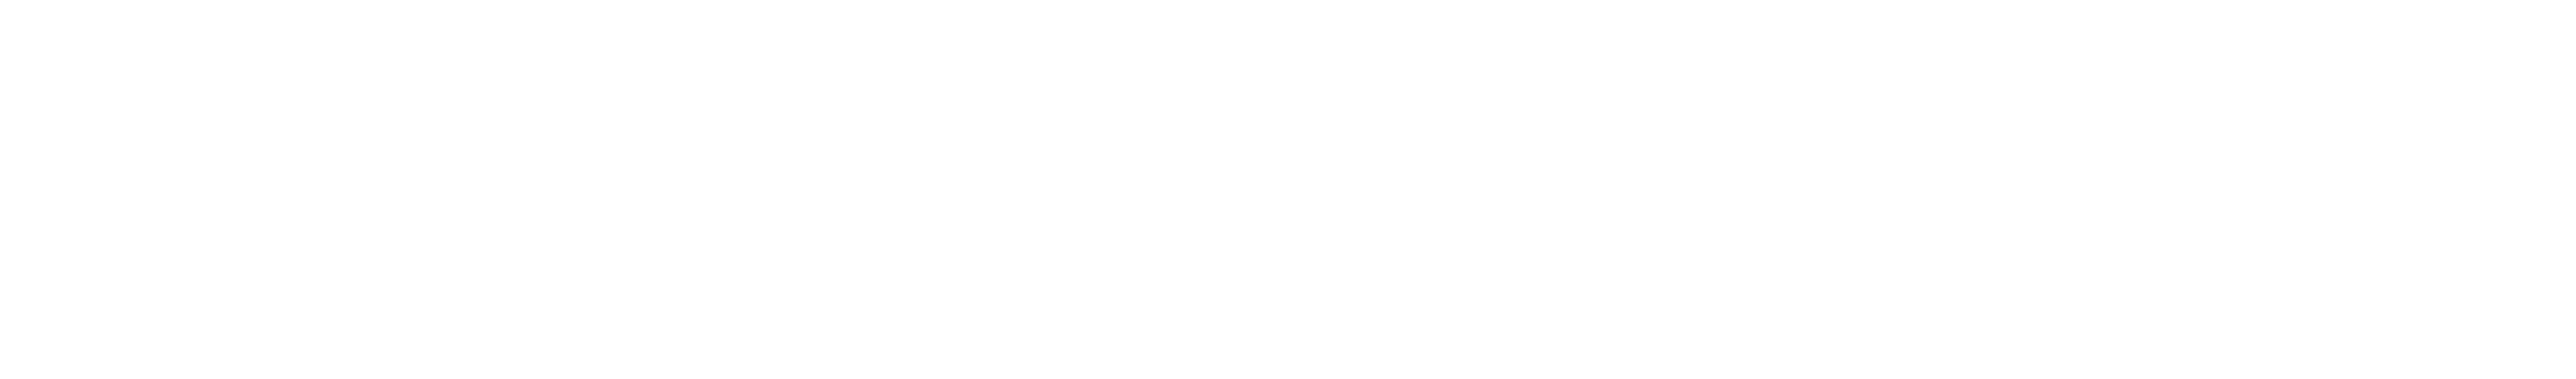 inbra-aerospace